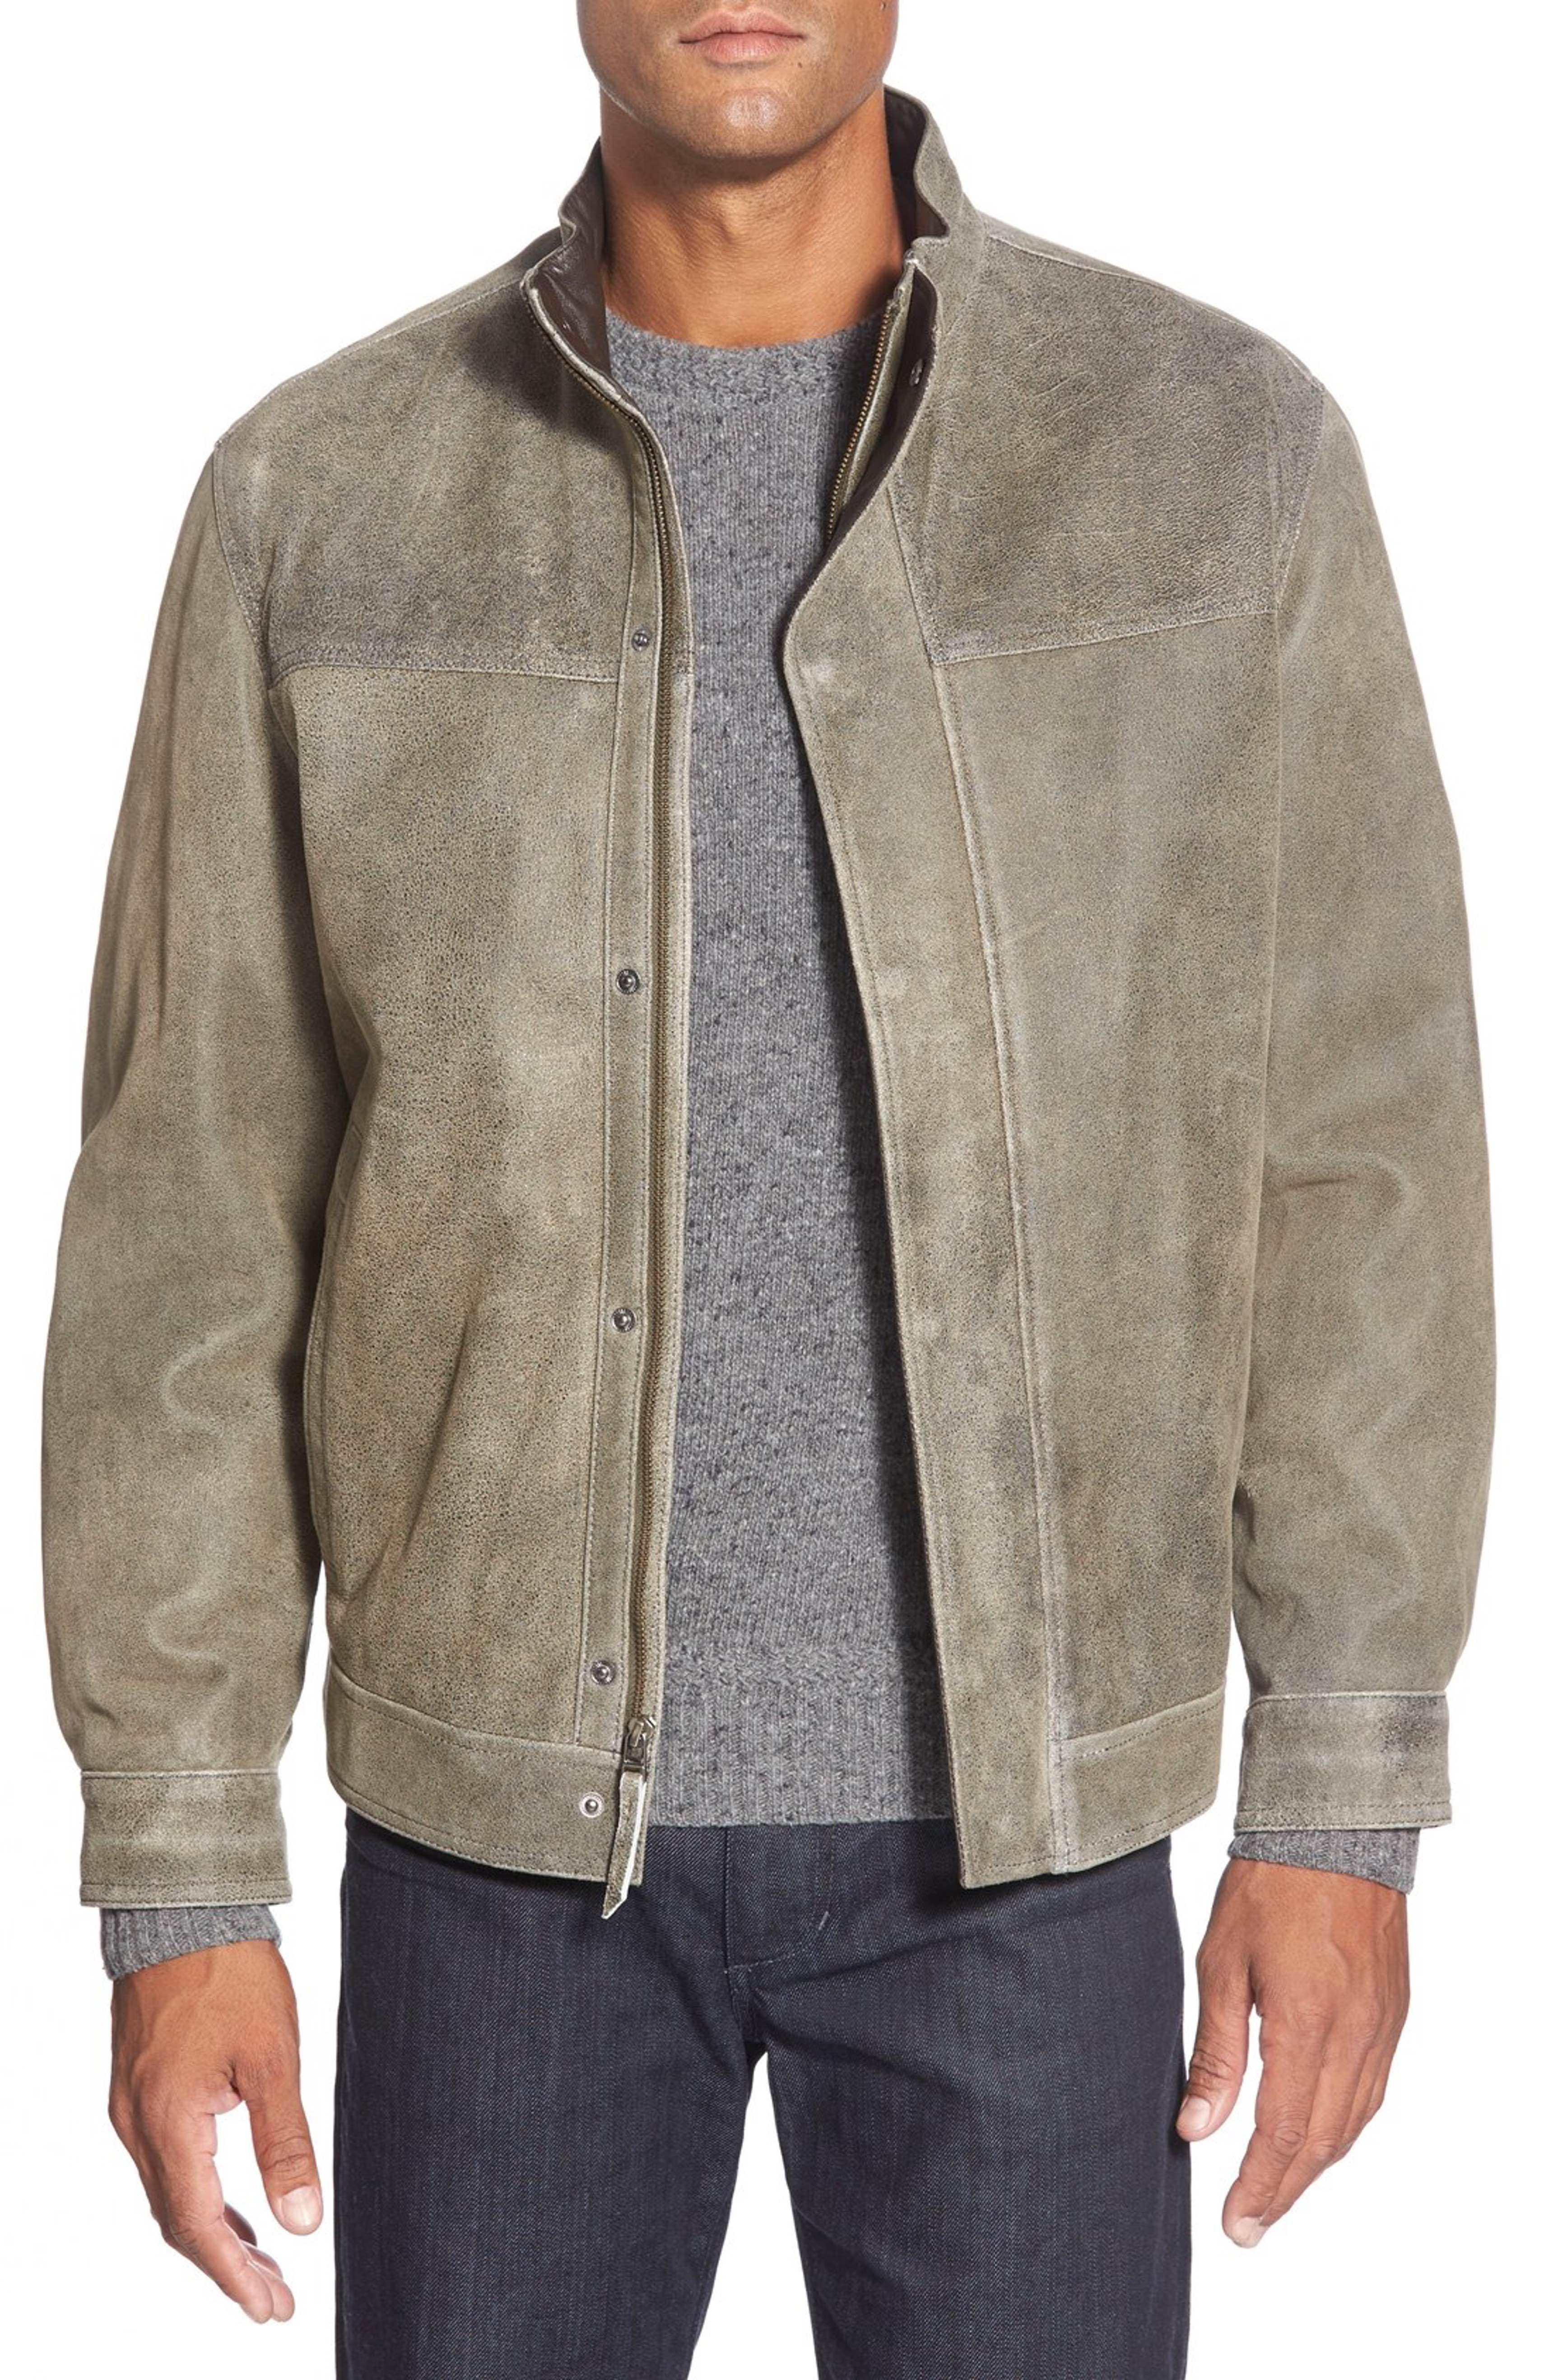 cheaper ca3de 1564b Main Image - Missani Le Collezioni Washed Leather Jacket ...